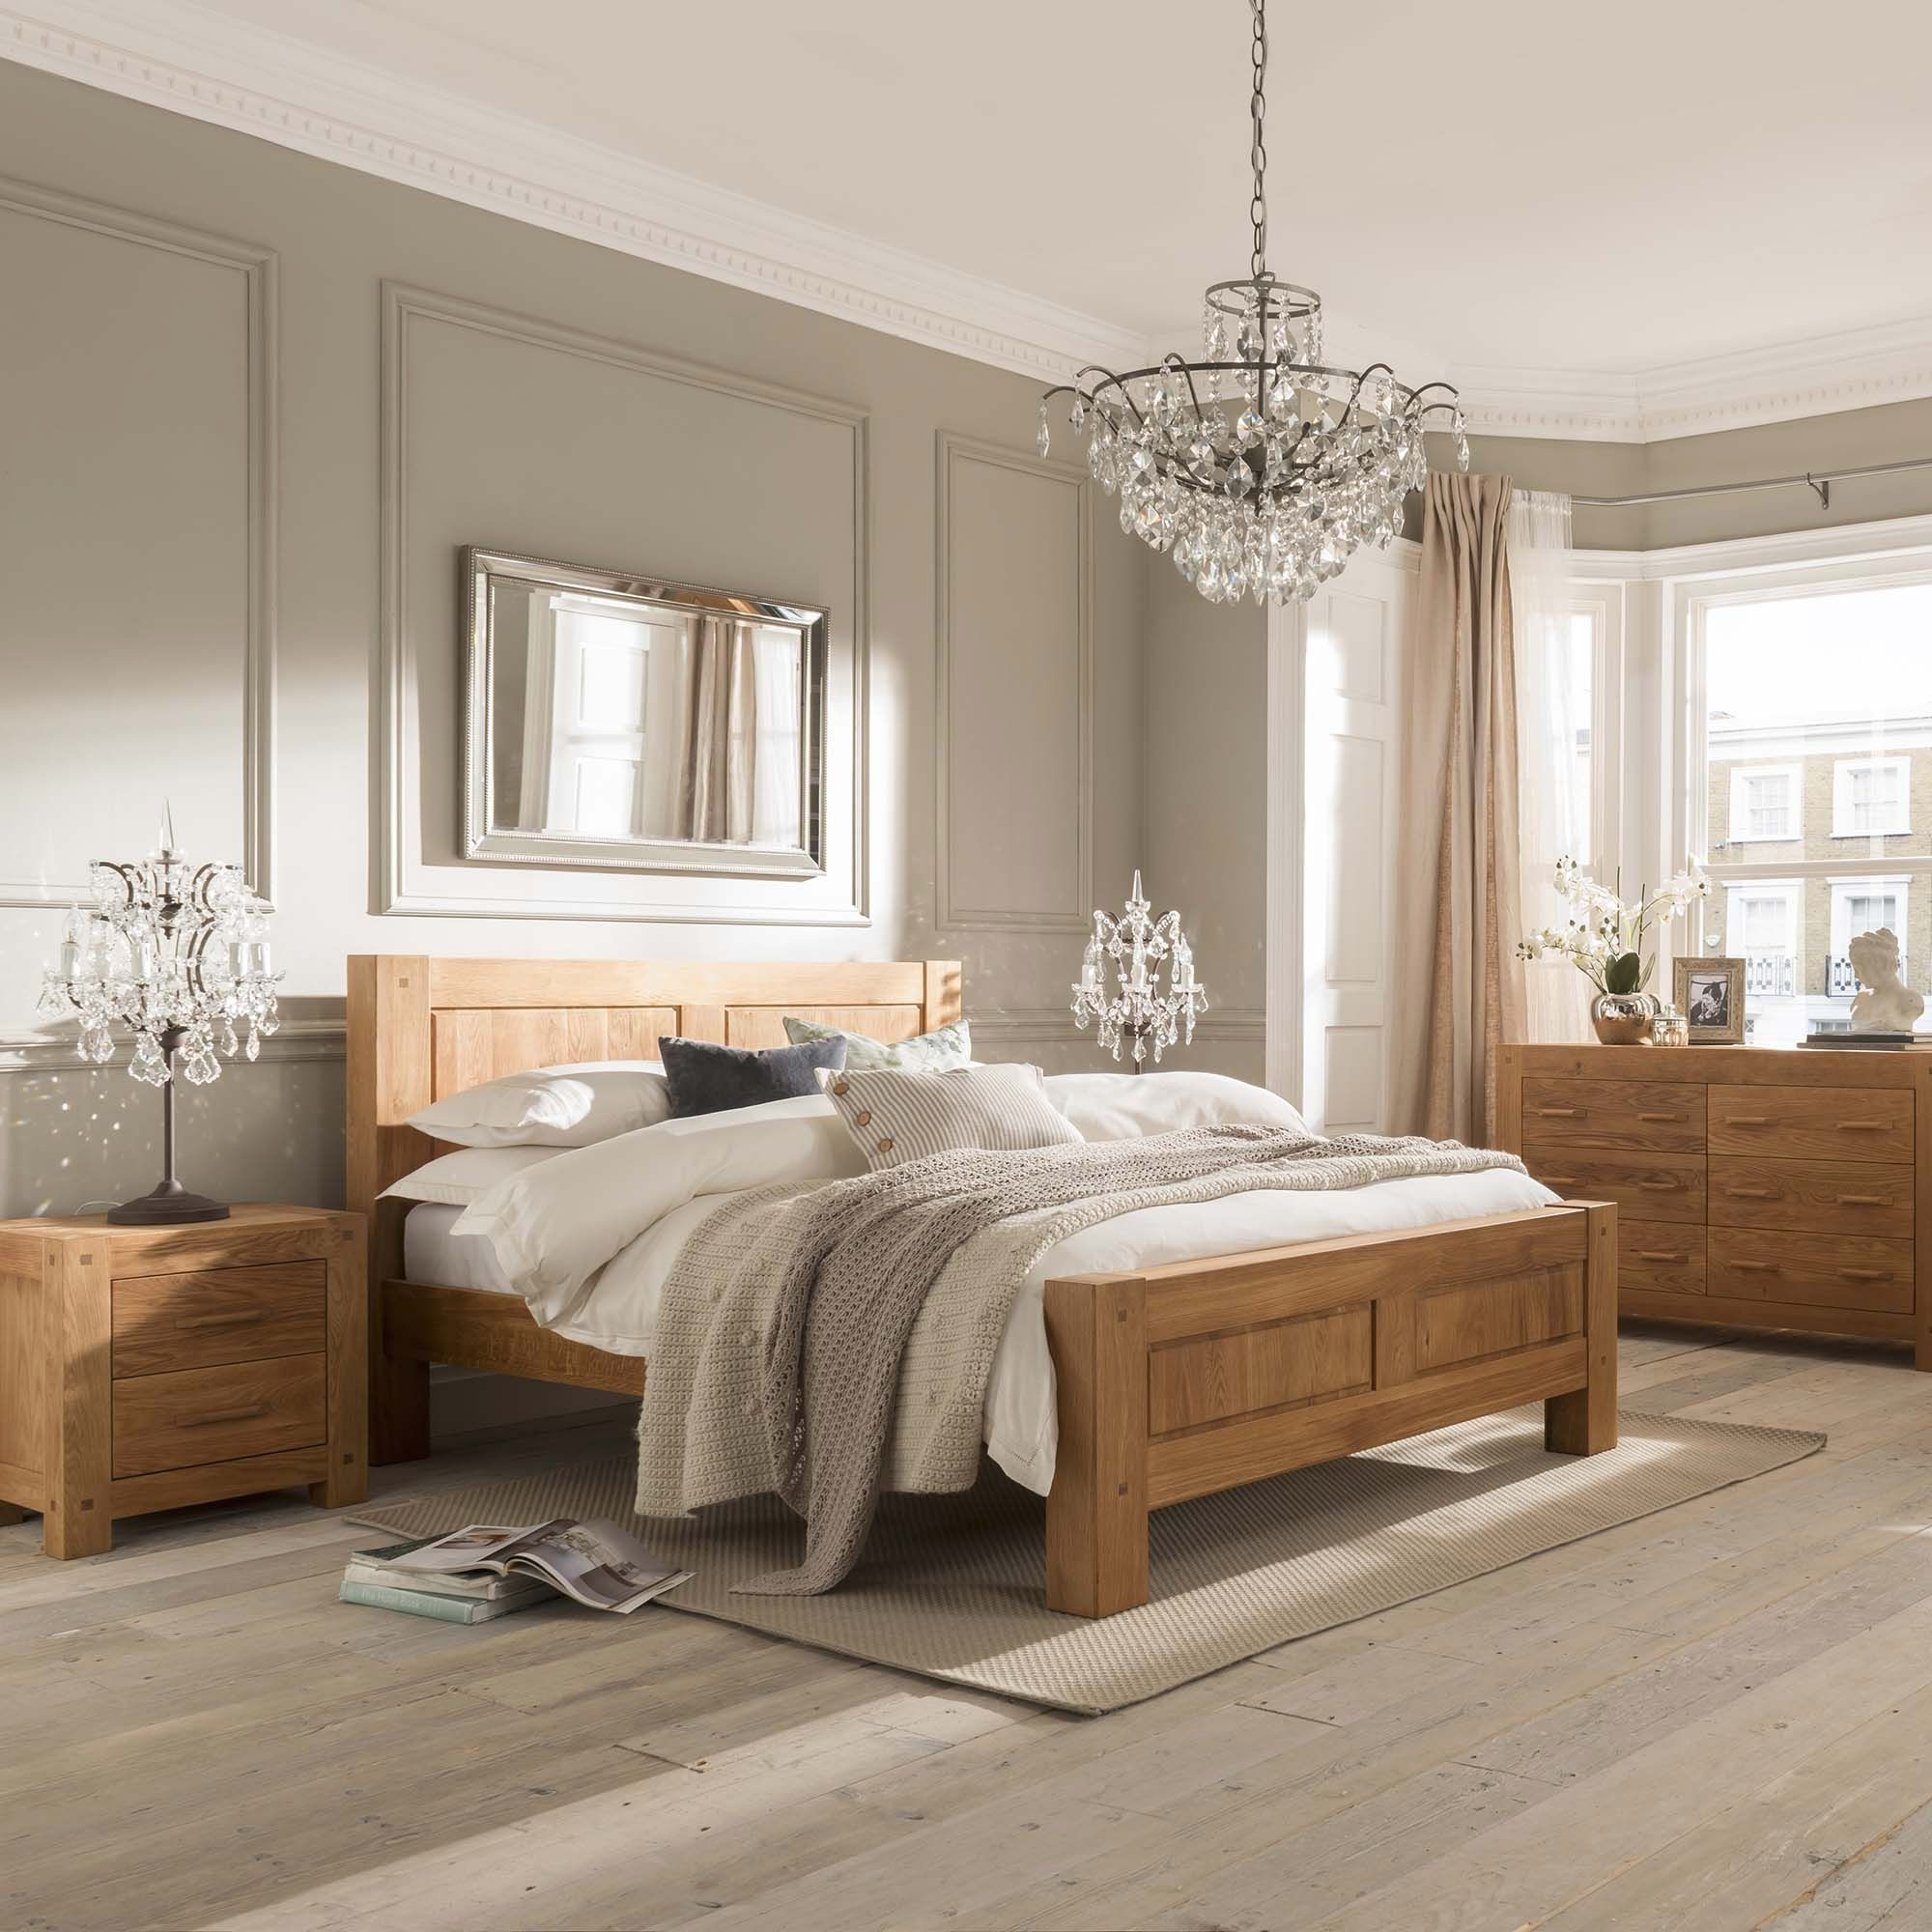 Bed Frames In 2020 Simple Bedroom Oak Bedroom Wooden Bedroom Furniture